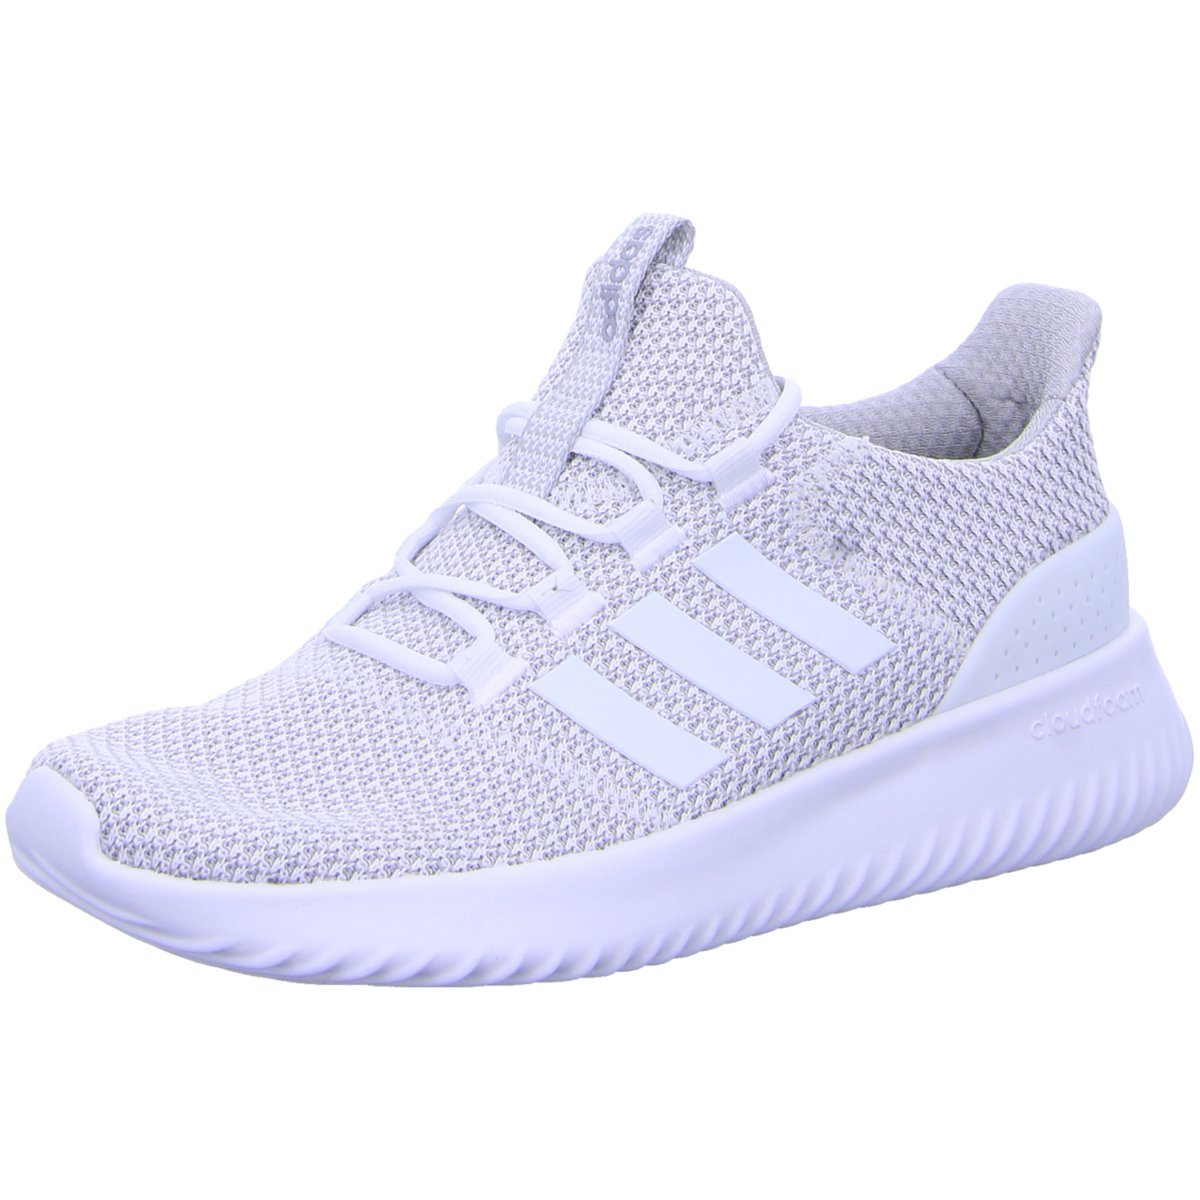 NEU adidas BC0121 Herren Sneaker Cloudfoam Ultimate BC0121 adidas weiß 334409 eac62f